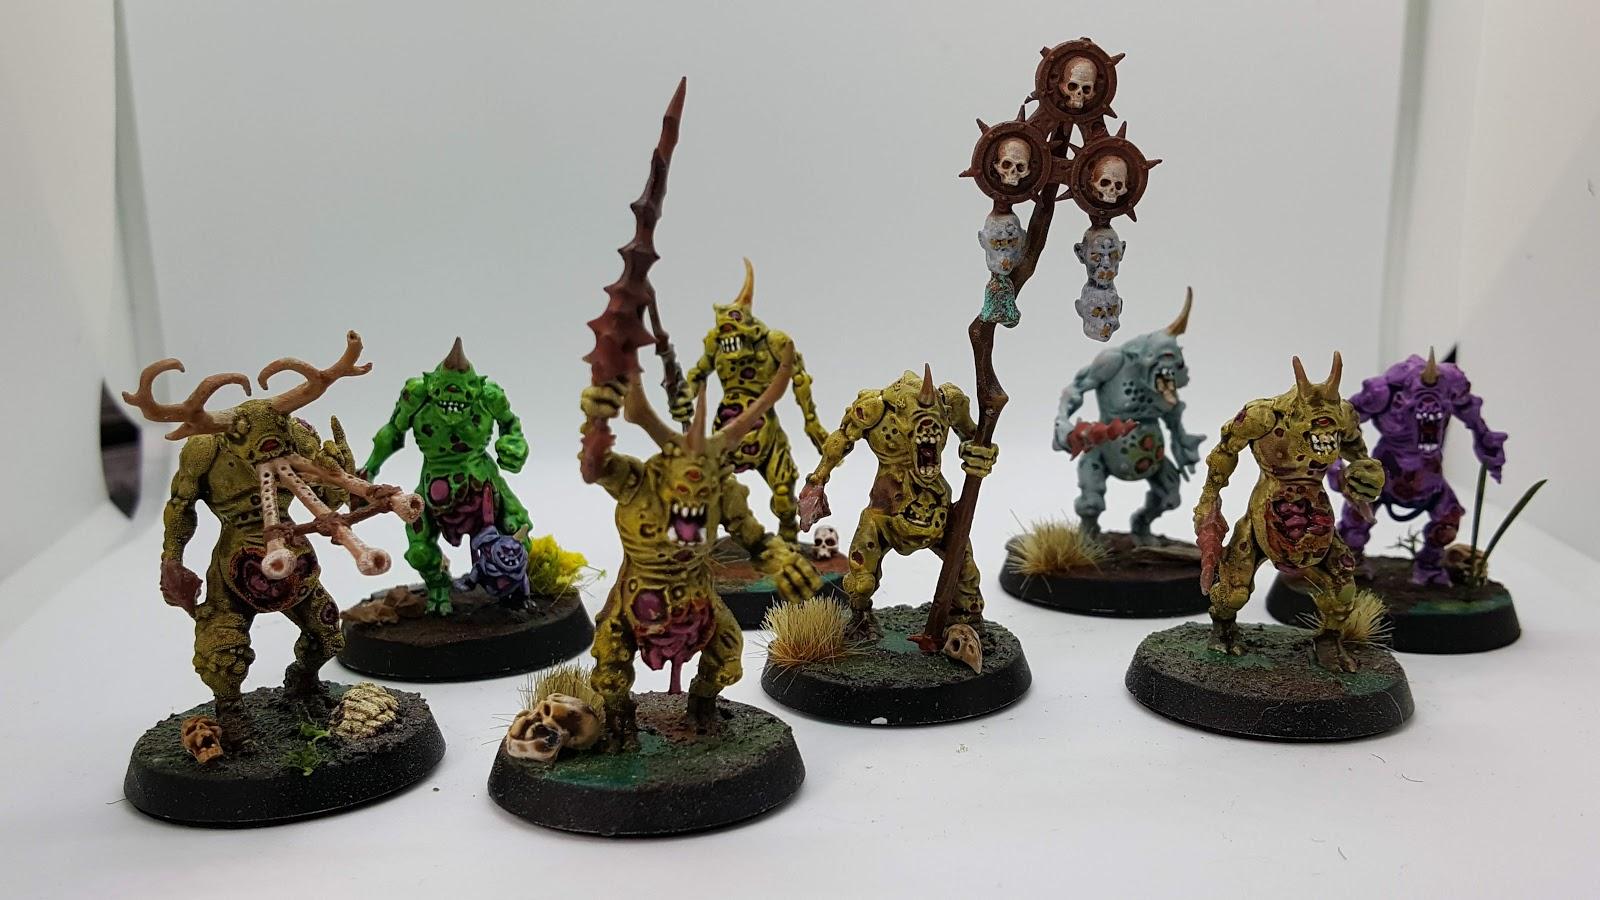 The Pustulent Soil - A Nurgle Army